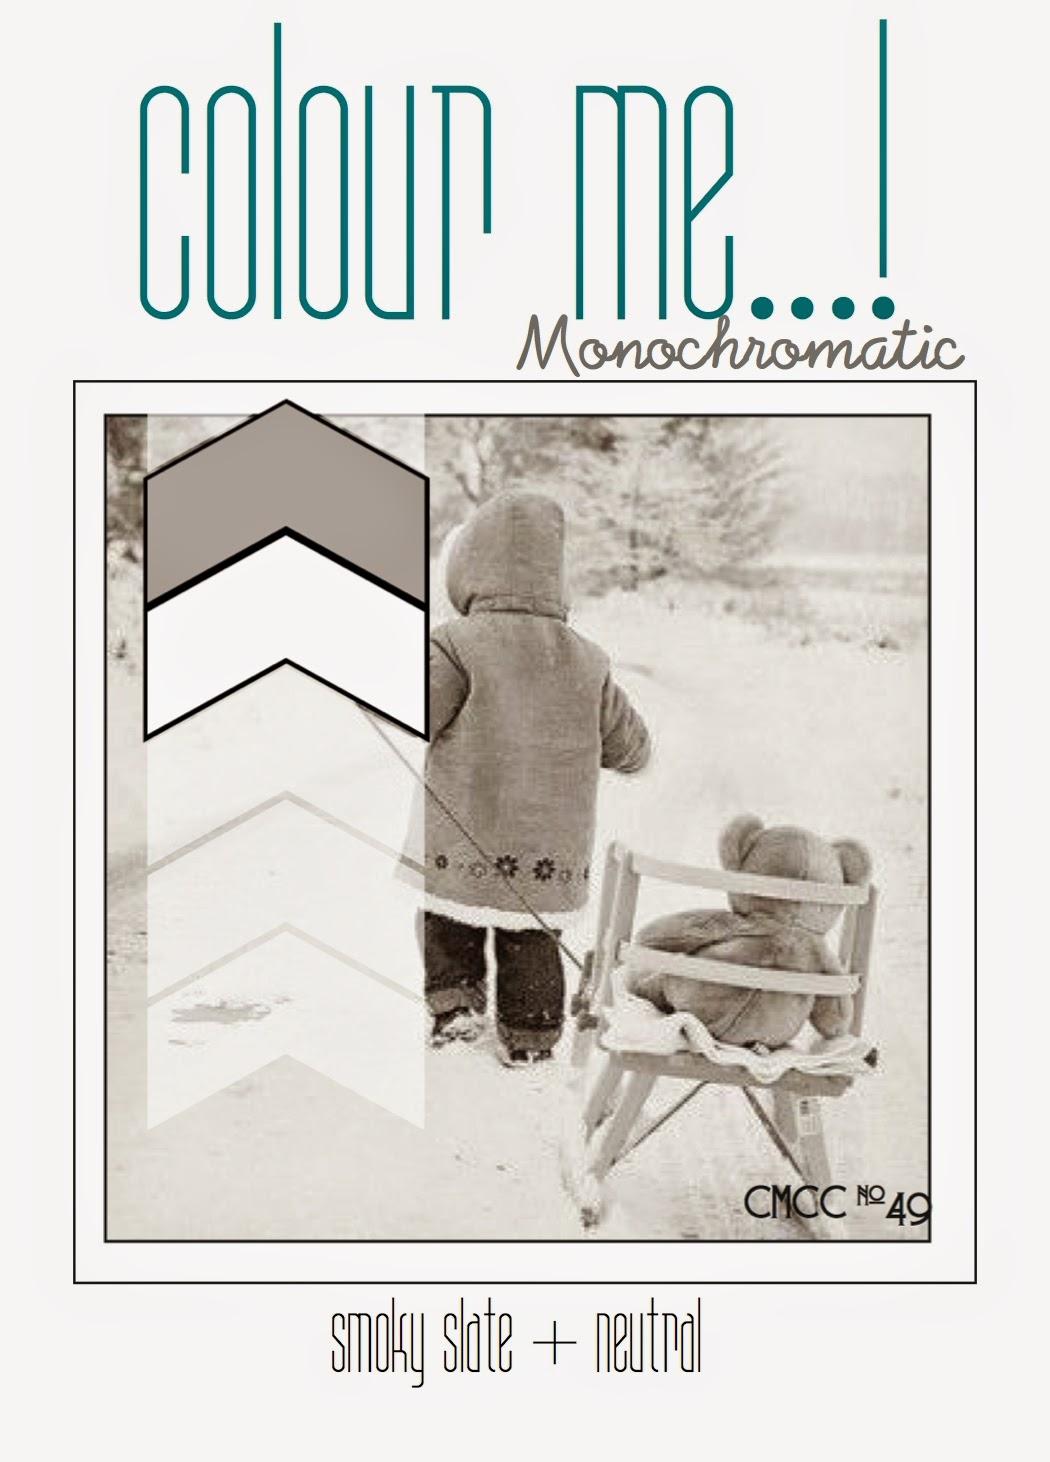 http://colourmecardchallenge.blogspot.com/2014/12/cmcc49-colour-me-monochromatic.html?utm_source=feedburner&utm_medium=email&utm_campaign=Feed%3A+blogspot%2FLMPiB+%28Colour+Me...%21%29